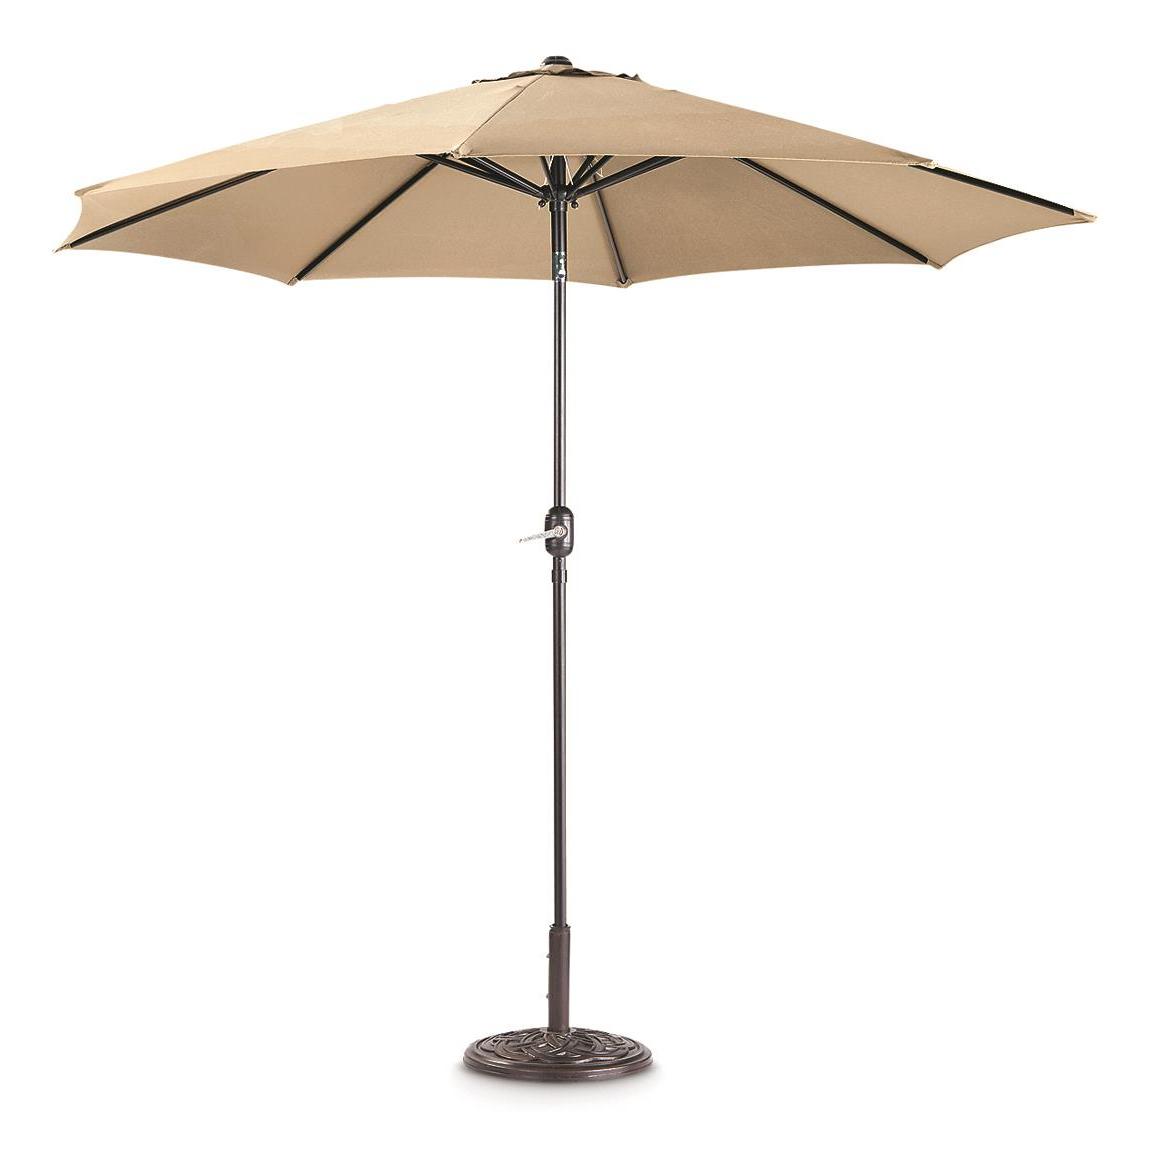 Market Umbrellas Inside Well Known Castlecreek 9' Market Patio Umbrella (View 16 of 20)